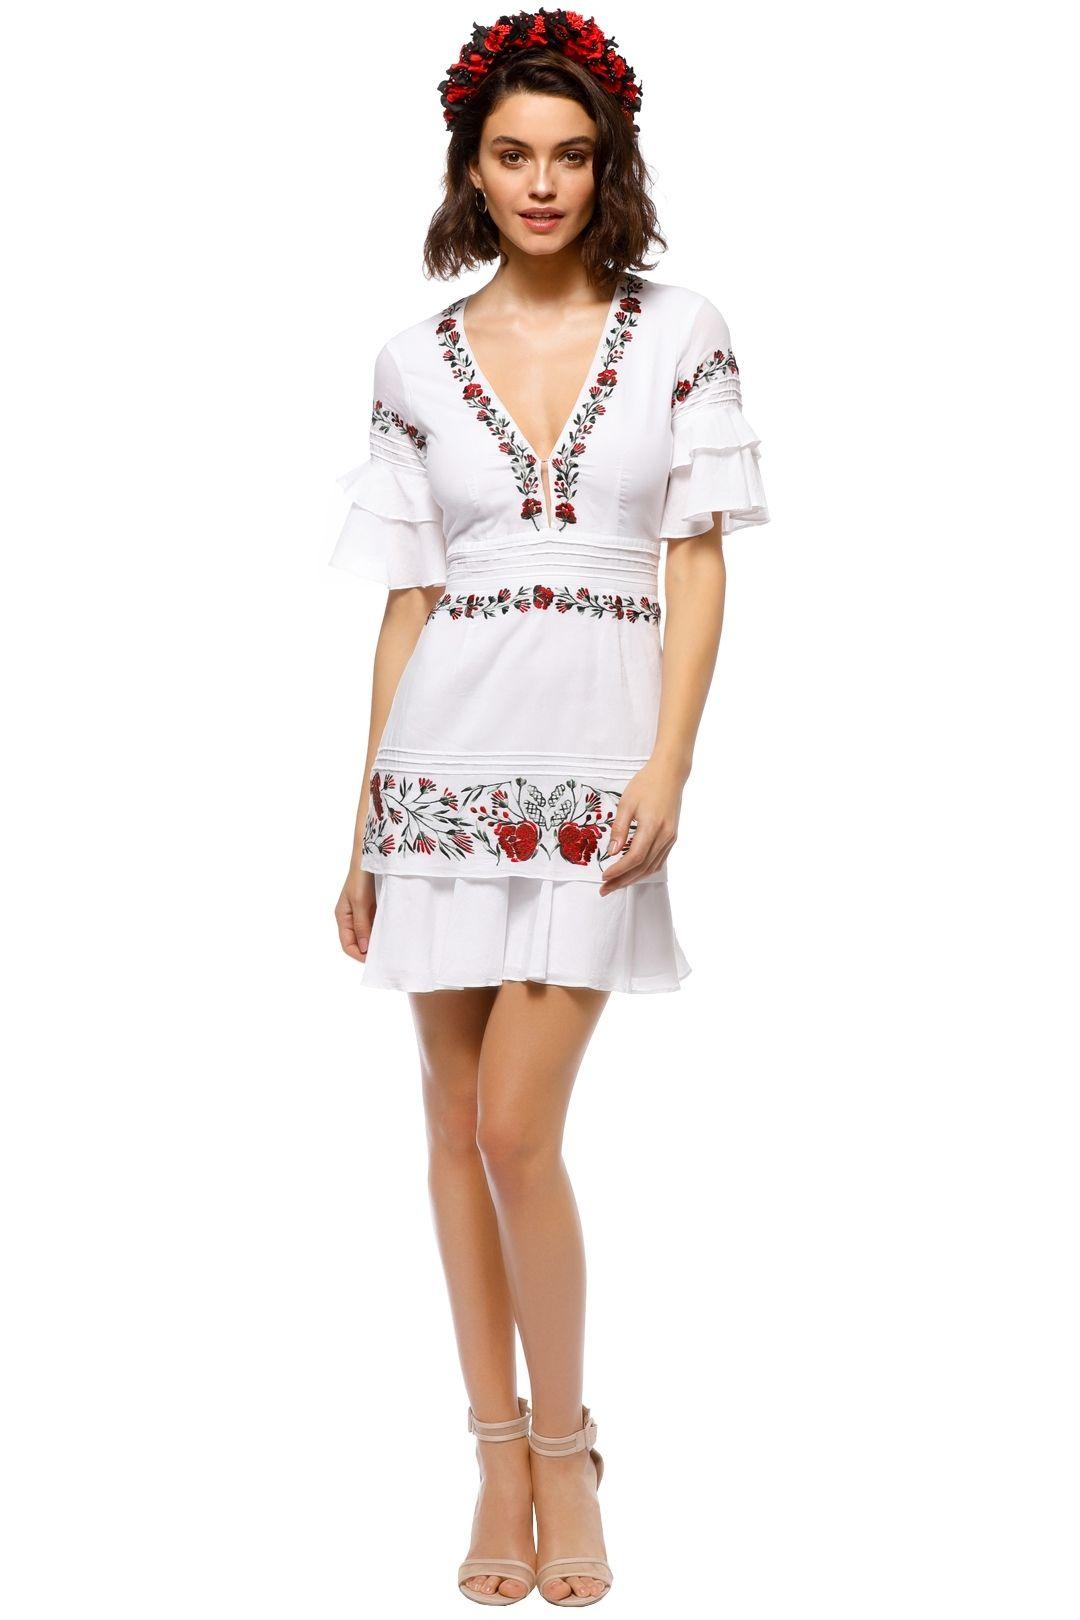 Saylor - Jayne Mini Dress - White - Front